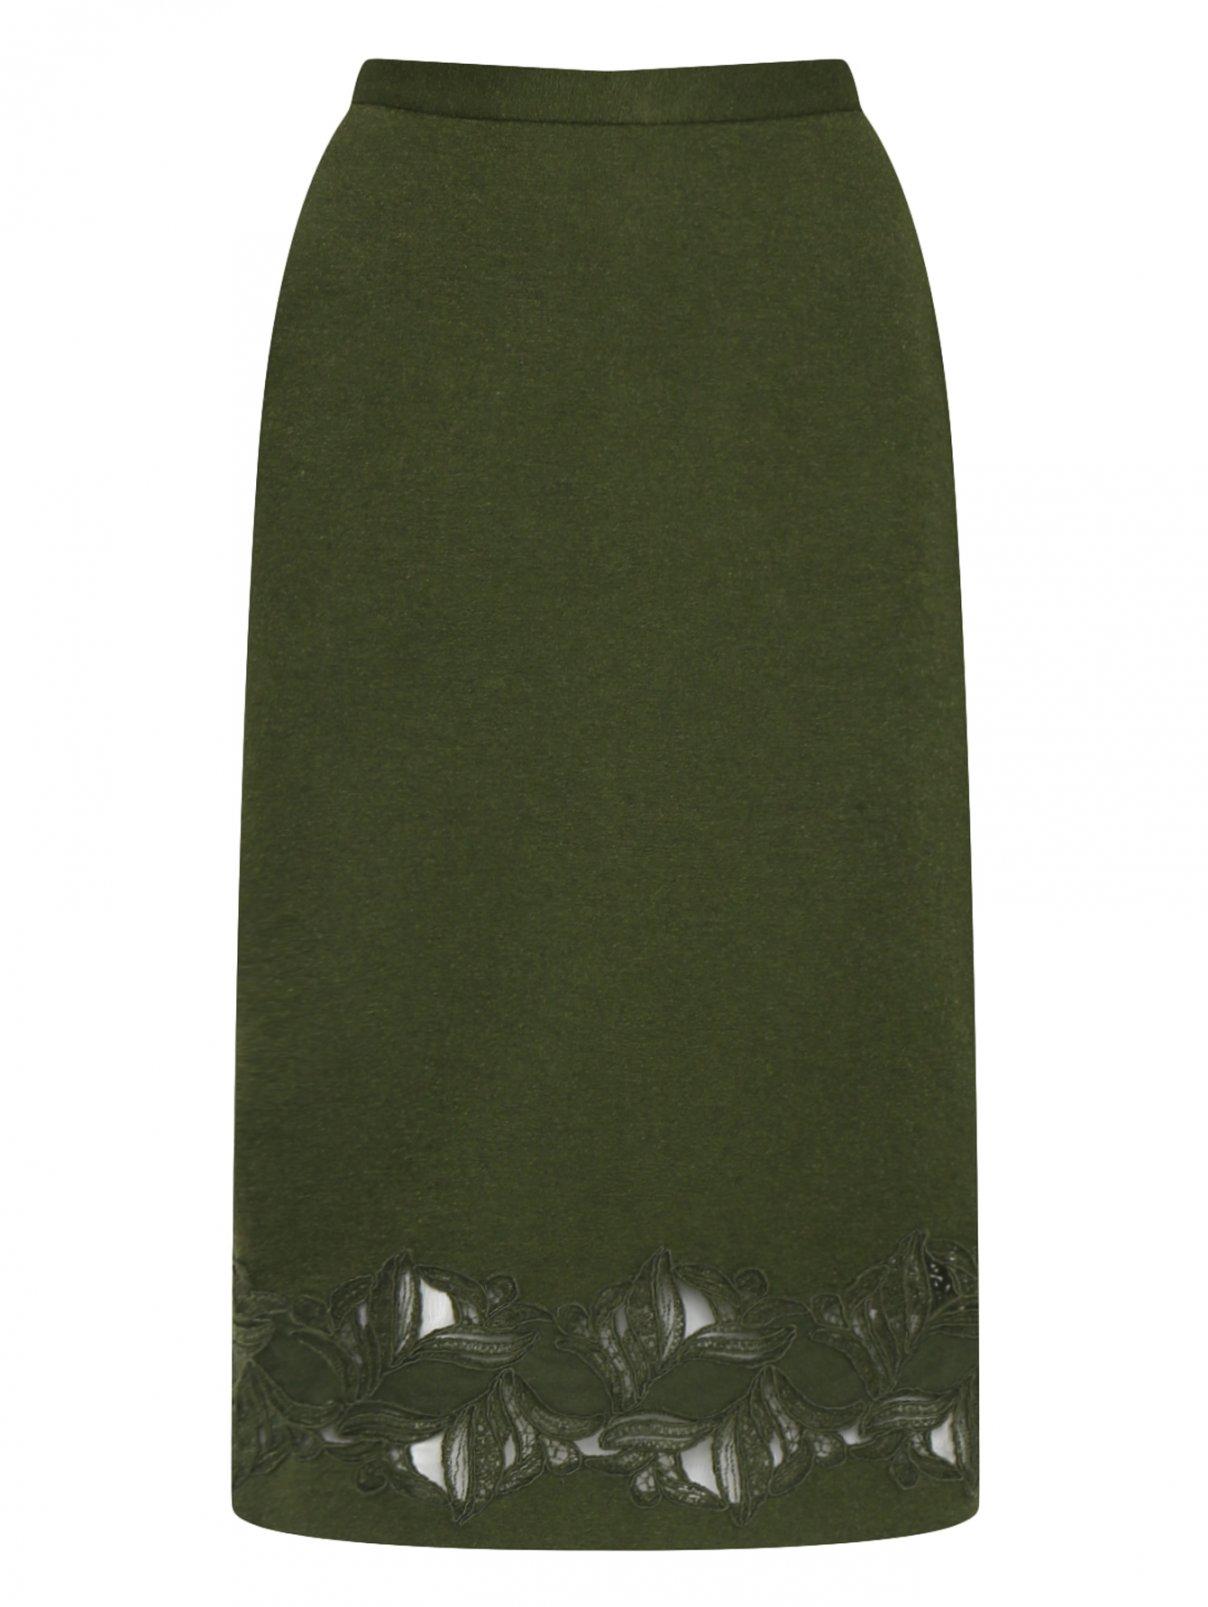 Юбка из шерсти, шелка и кашемира с кружевом Ermanno Scervino  –  Общий вид